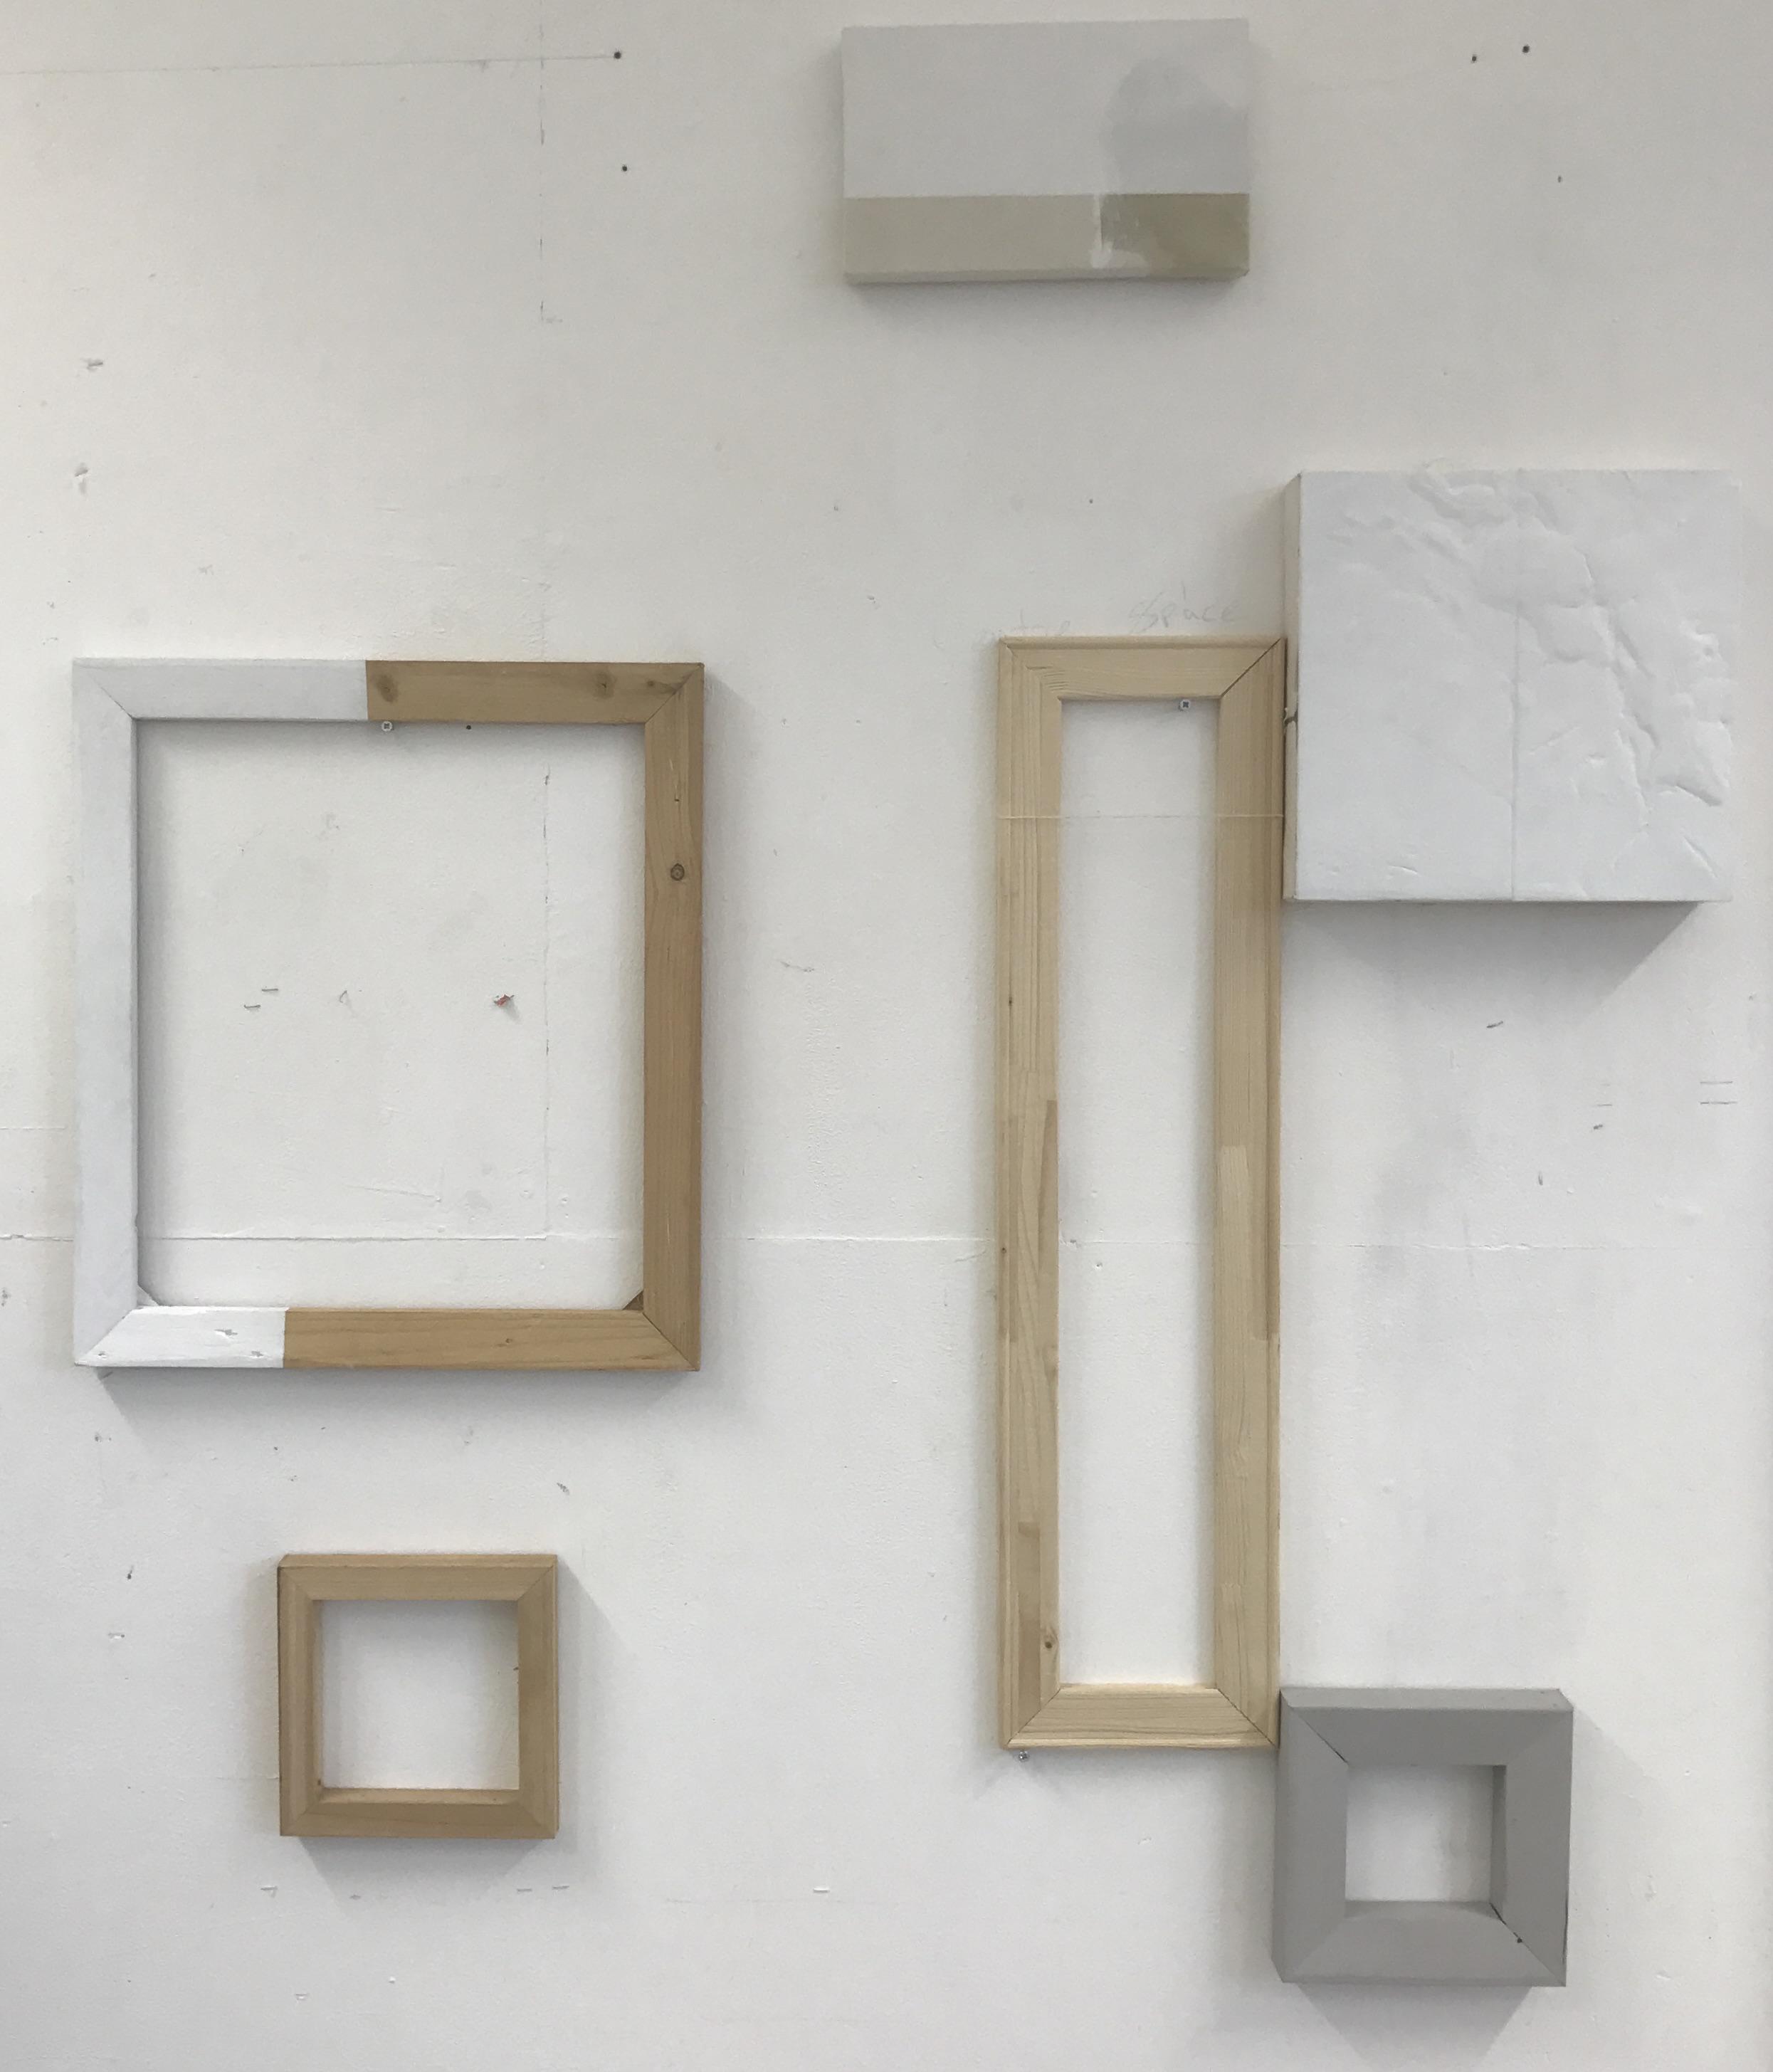 Ally McGinn (2017) Studio view.  Empty frames with a balanced aesthetic.